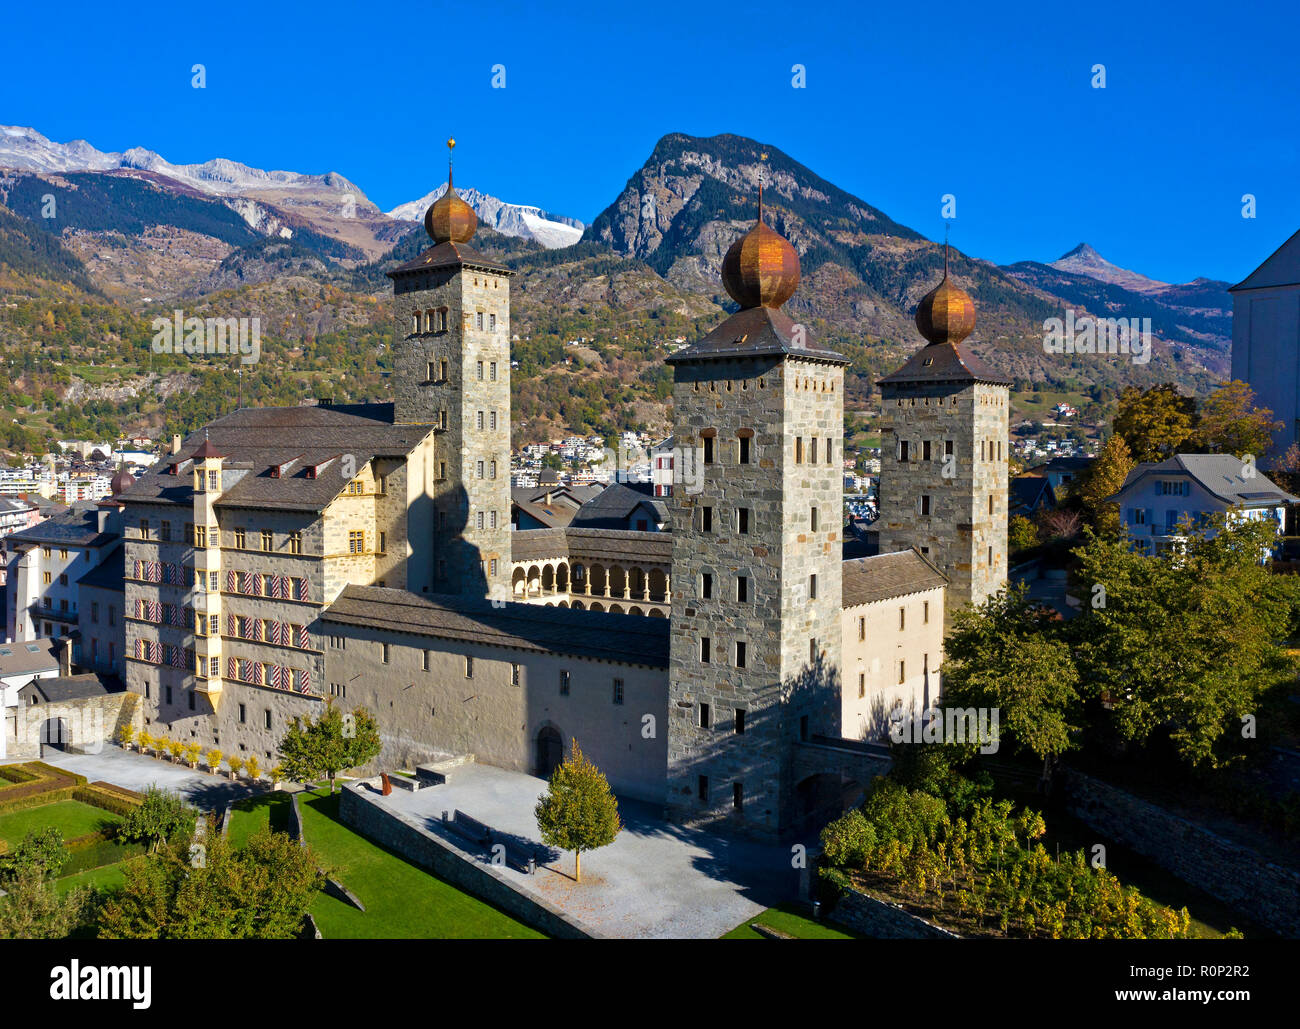 The medieval palace Stockalperpalast, Brig, Valais, Switzerland - Stock Image